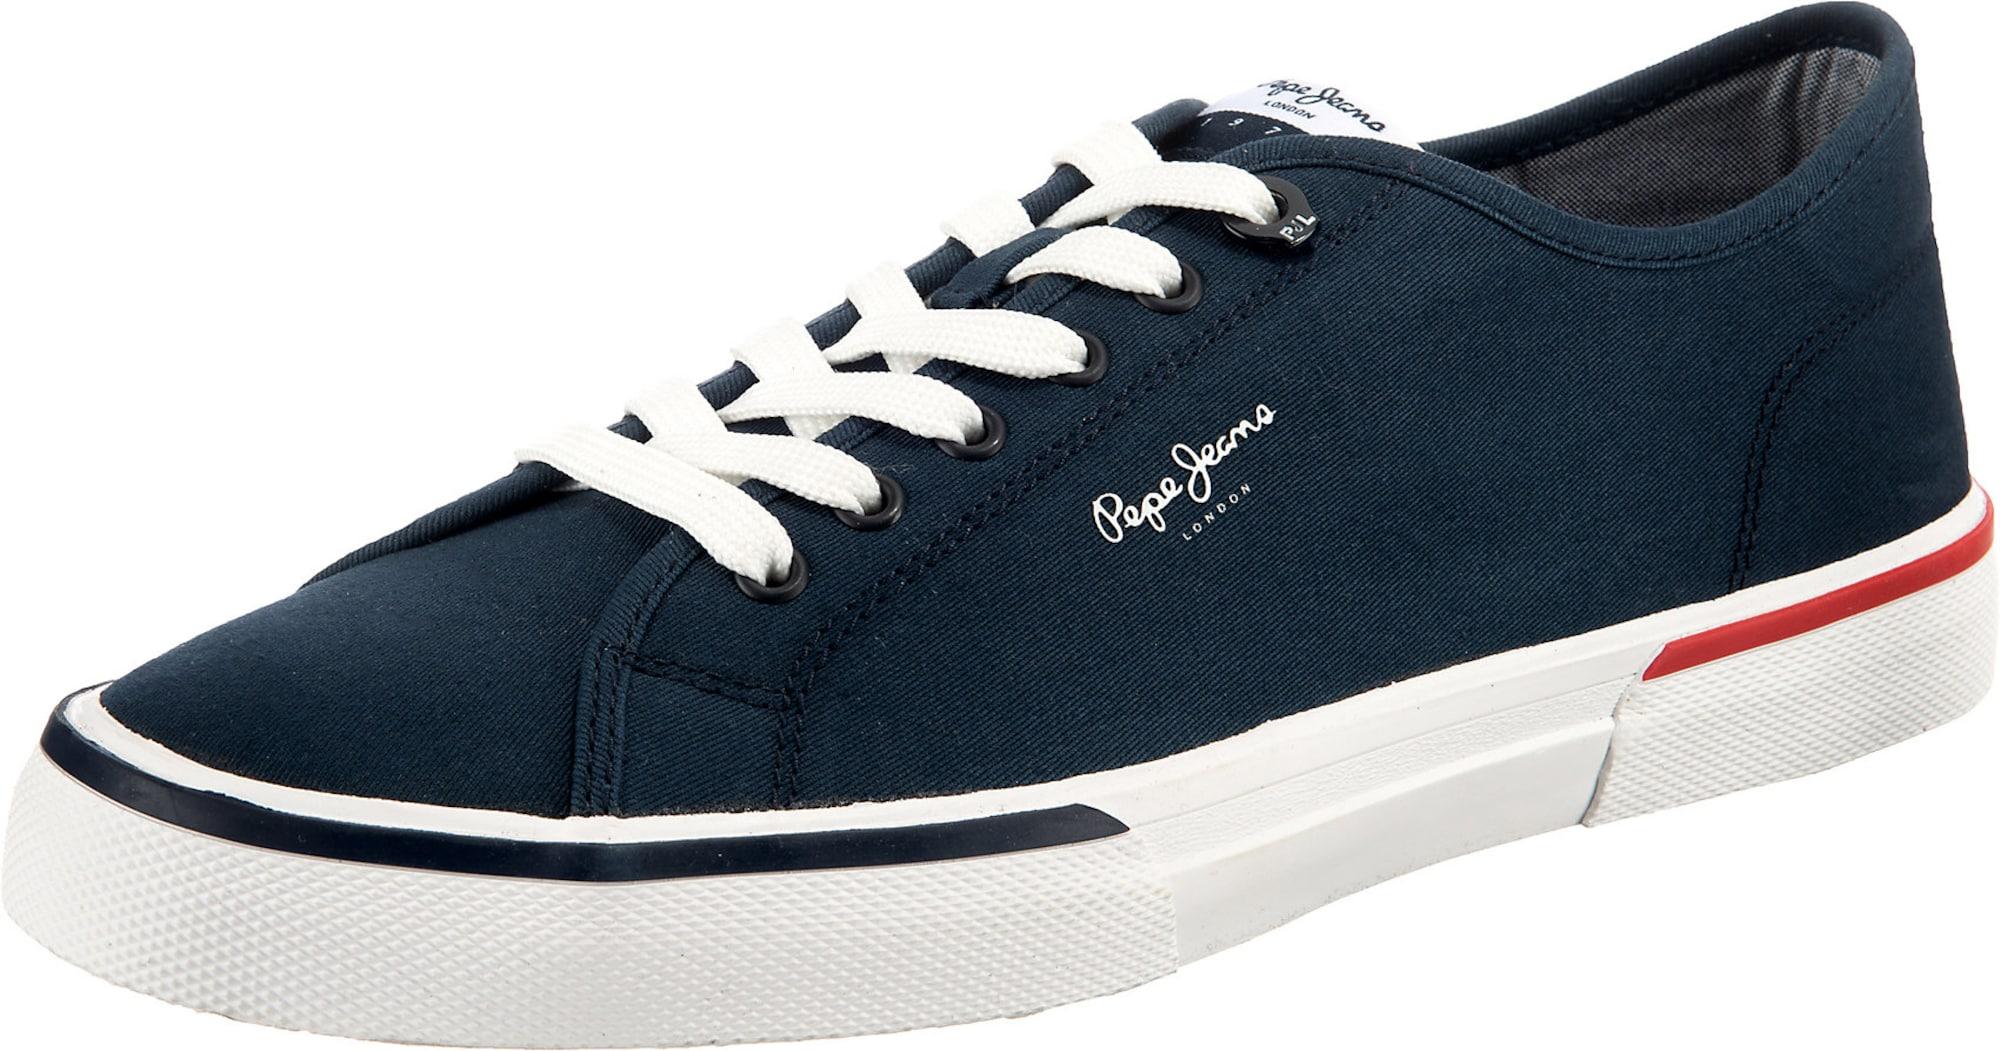 Pepe Jeans Tenisky  tmavě modrá